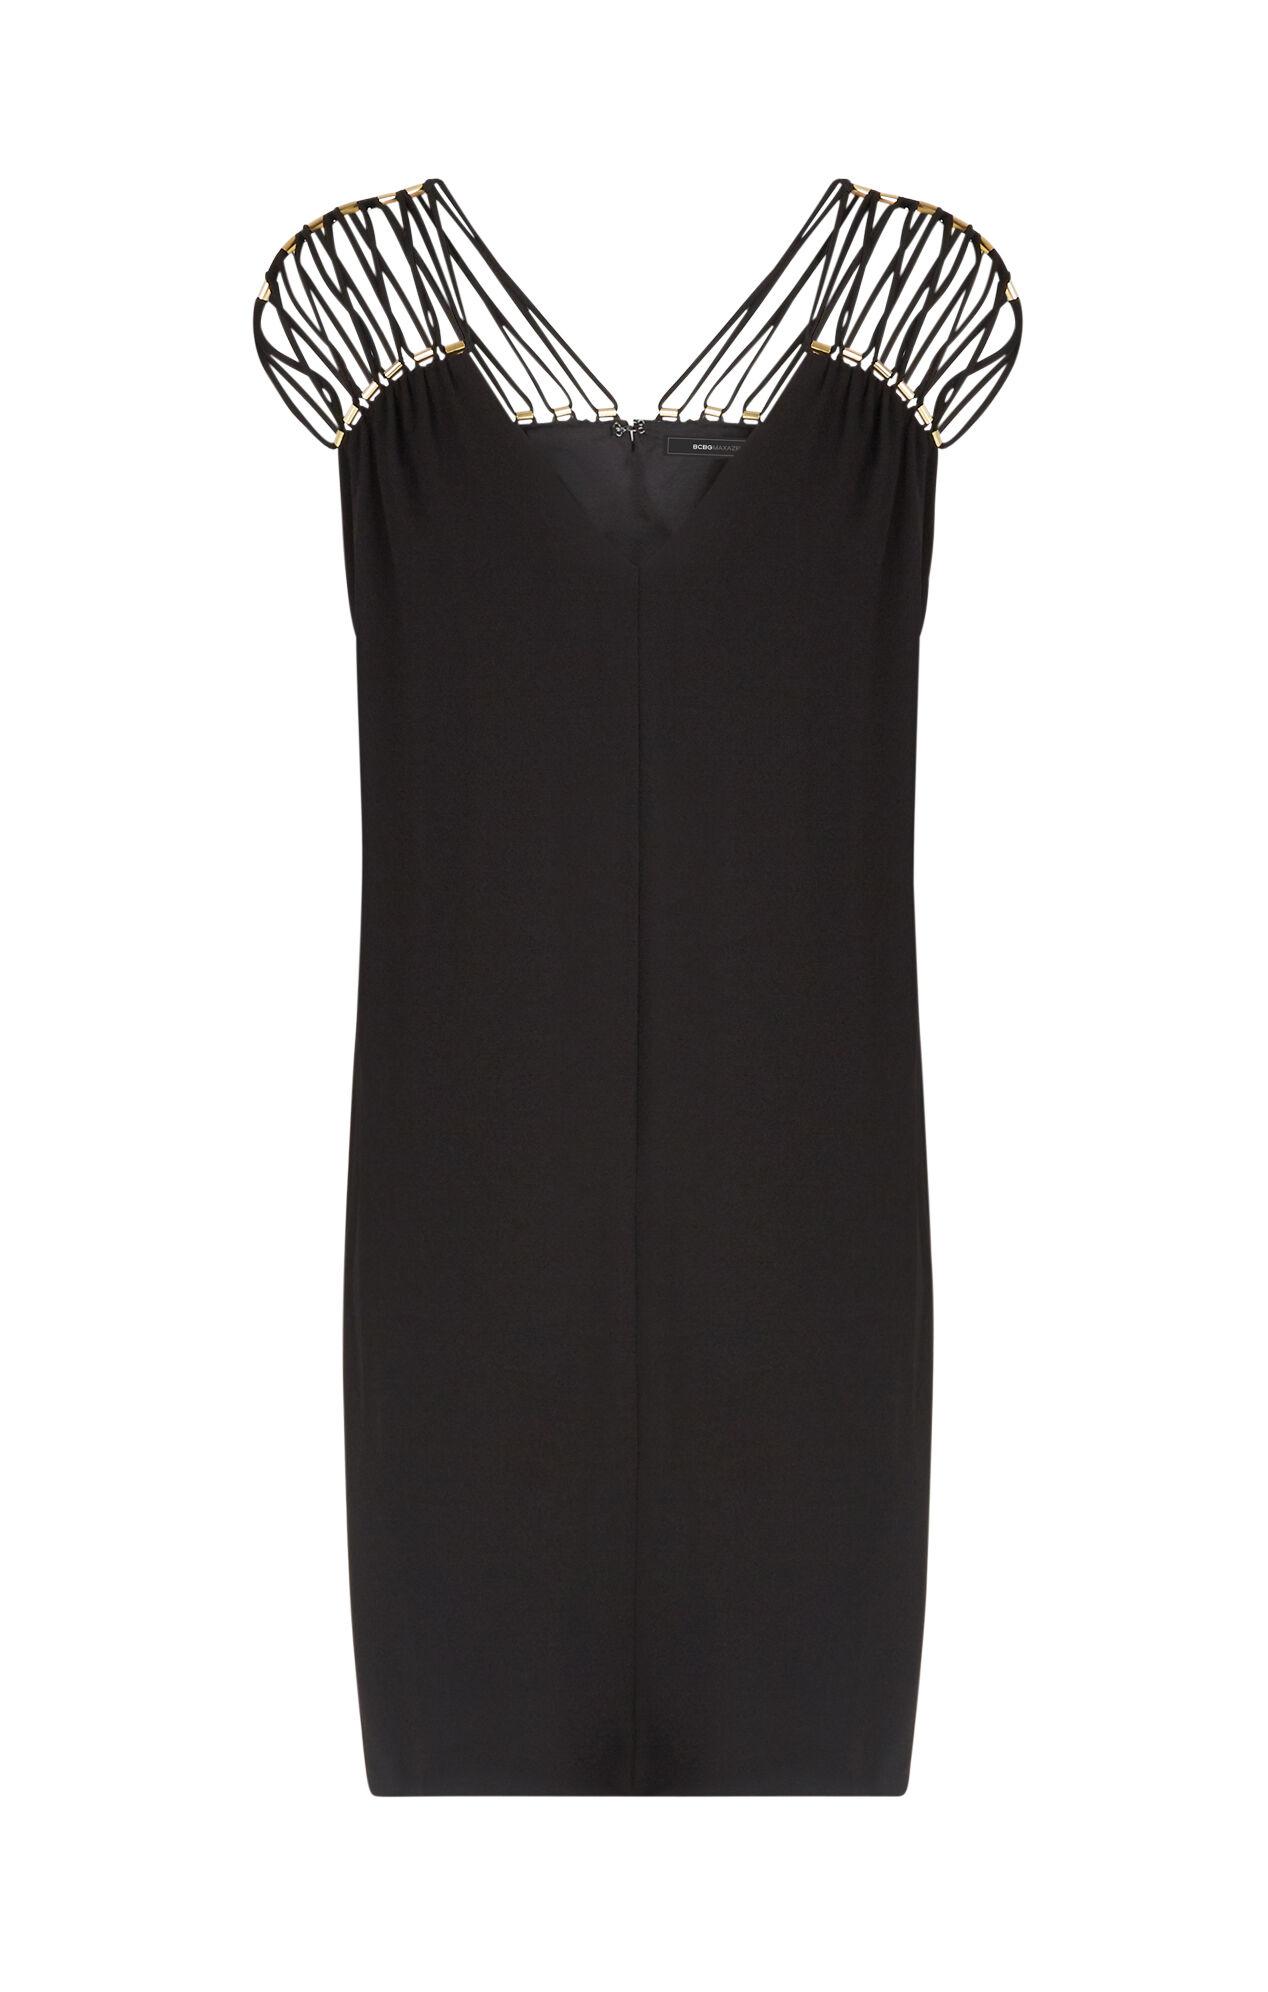 Arielle Multi-Strap Dress